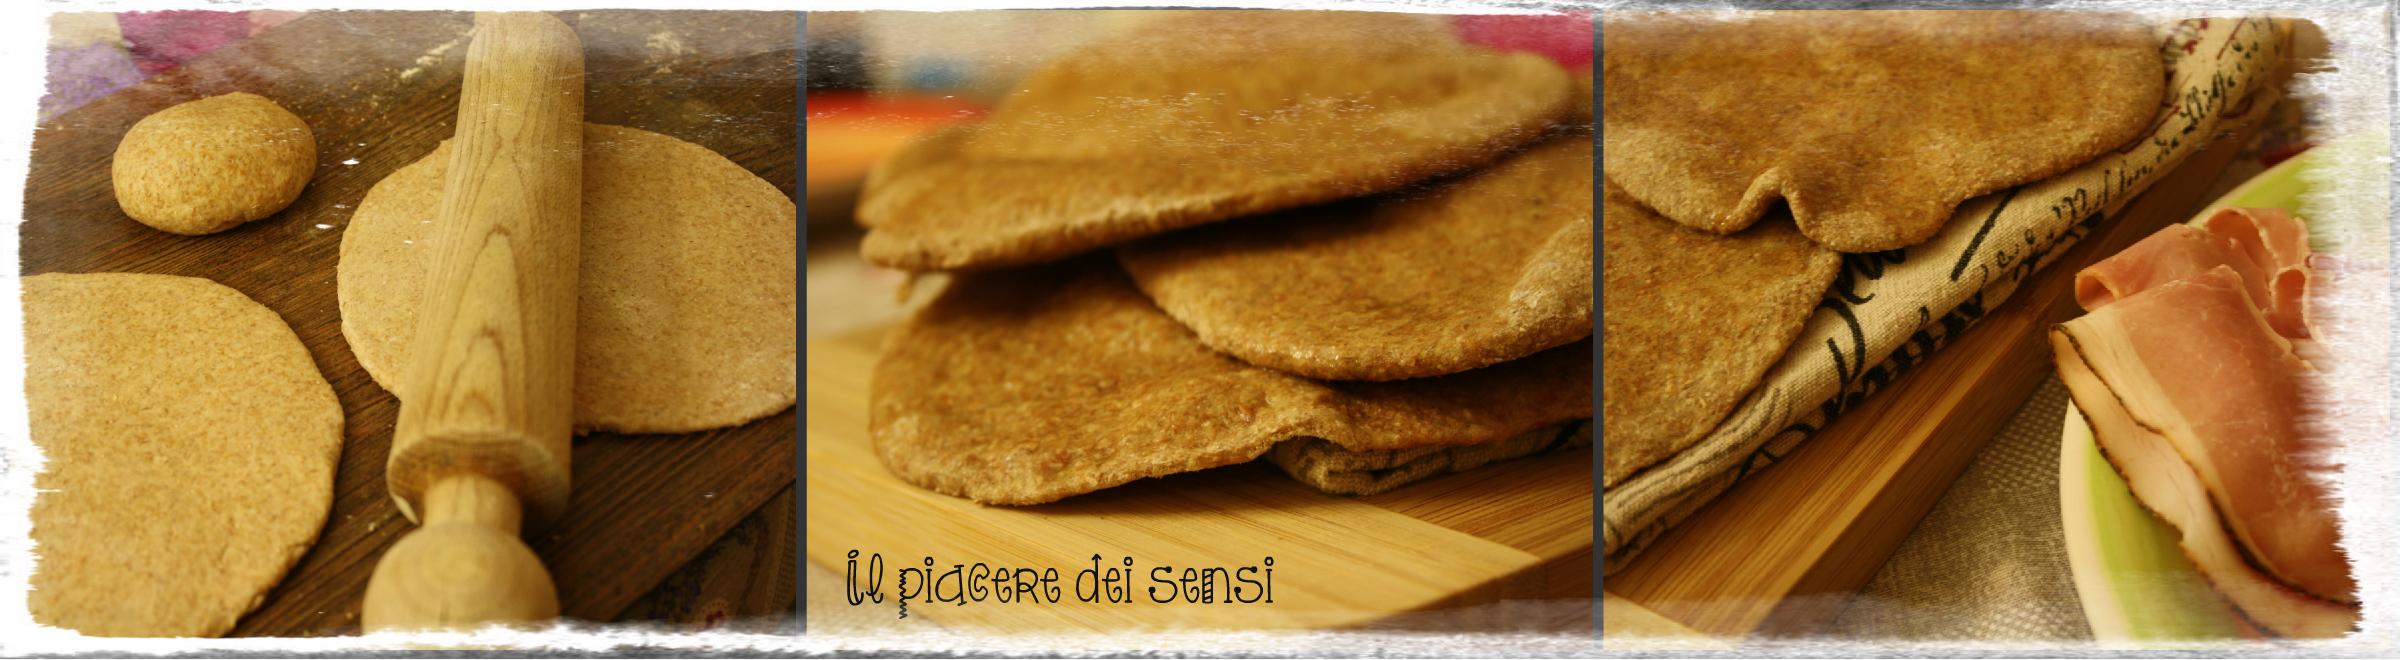 Collage Tandoori roti - pane indiano integrale senza lievito